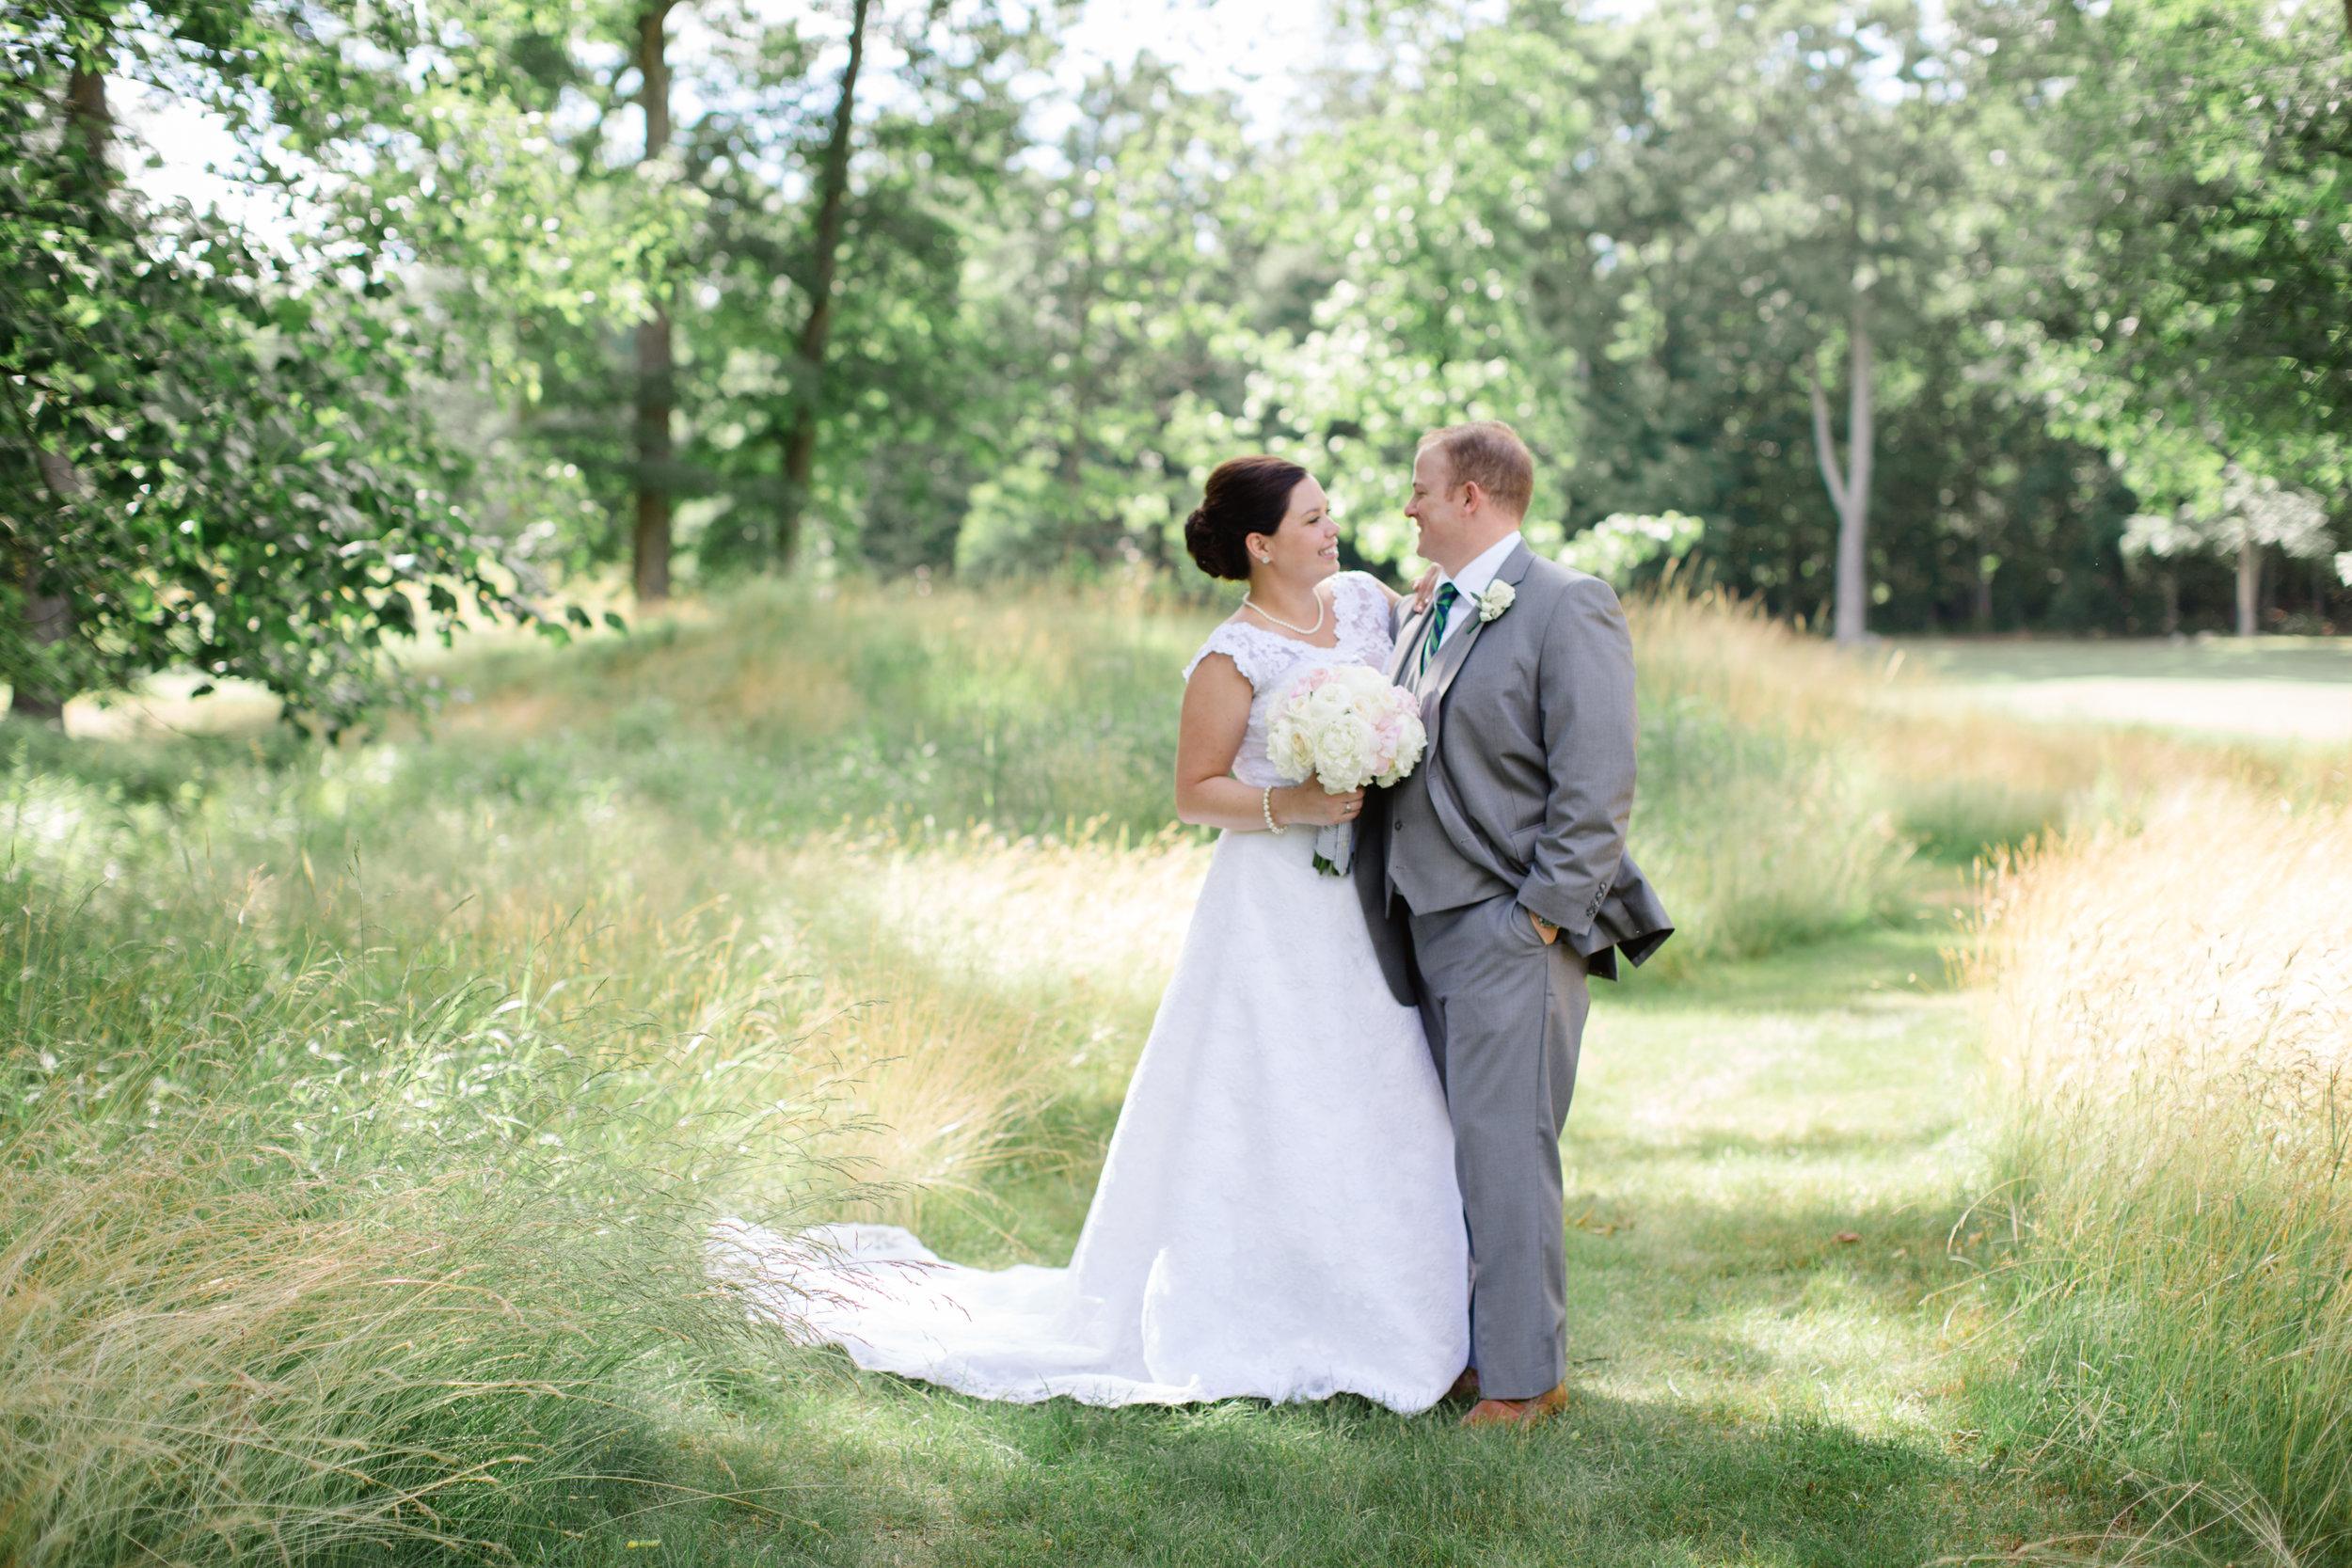 Glenmaura Country Club Scranton PA Wedding Photos_JDP-6330.jpg